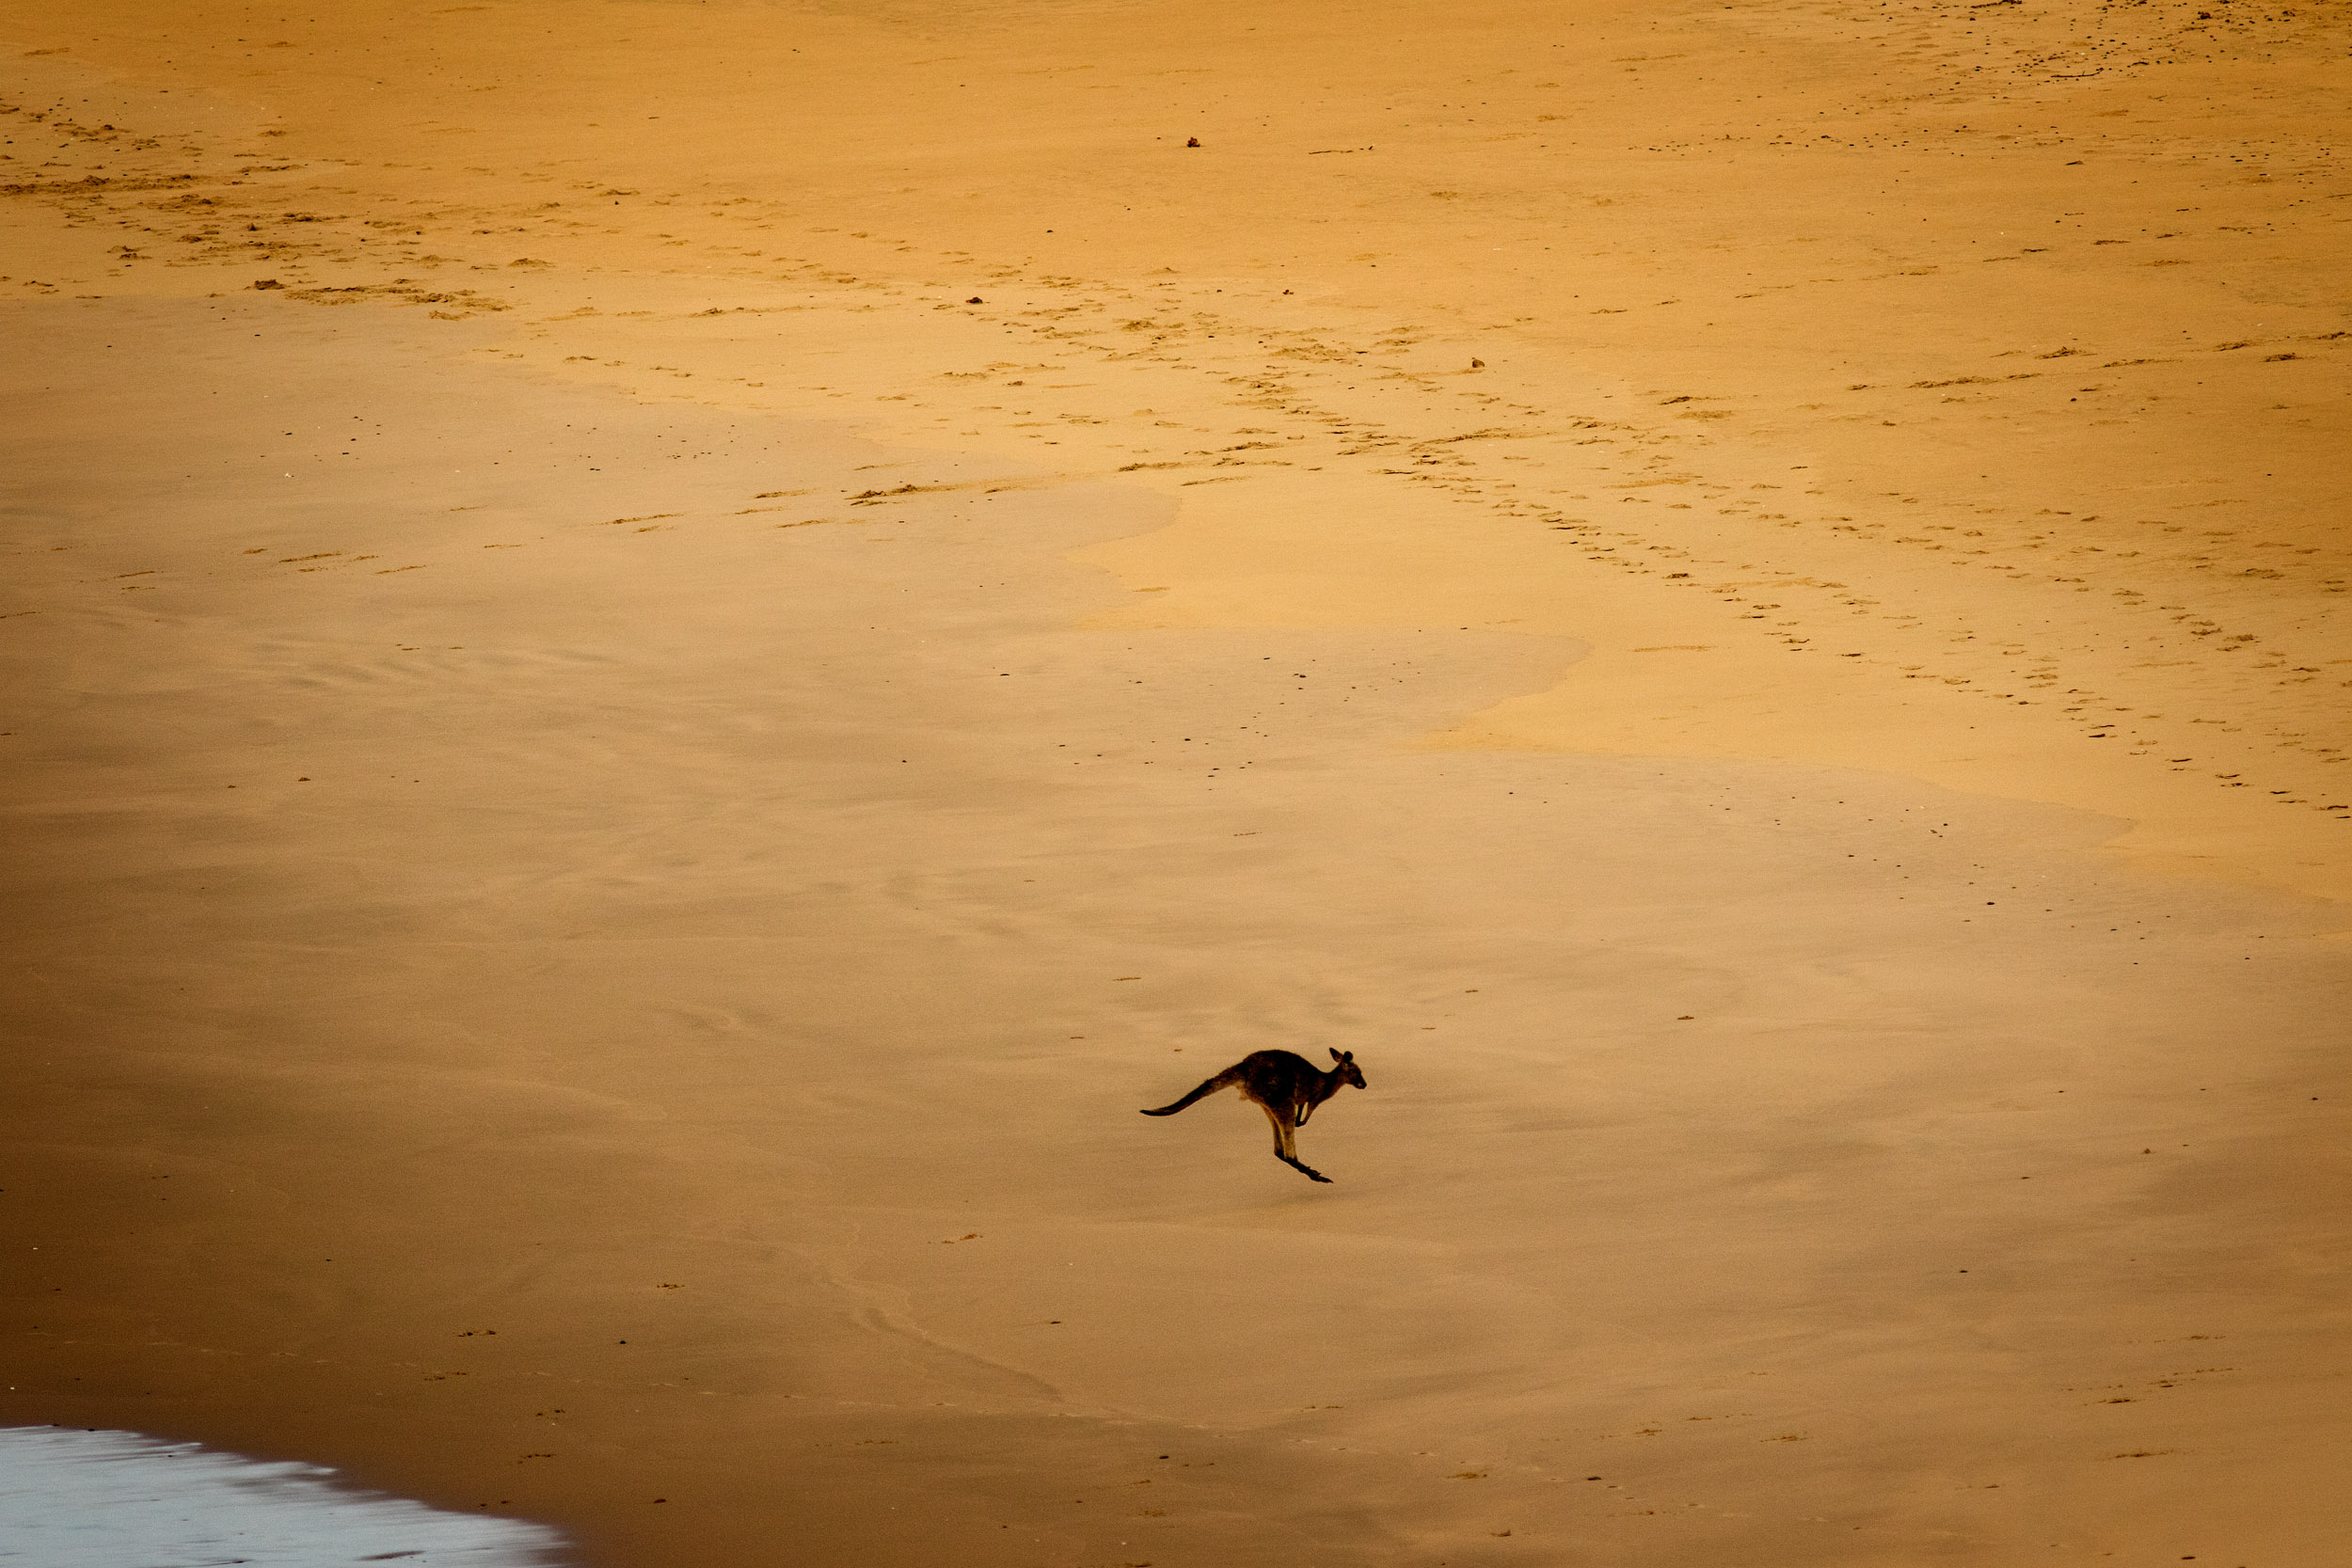 kangaroos-on-beach.jpg